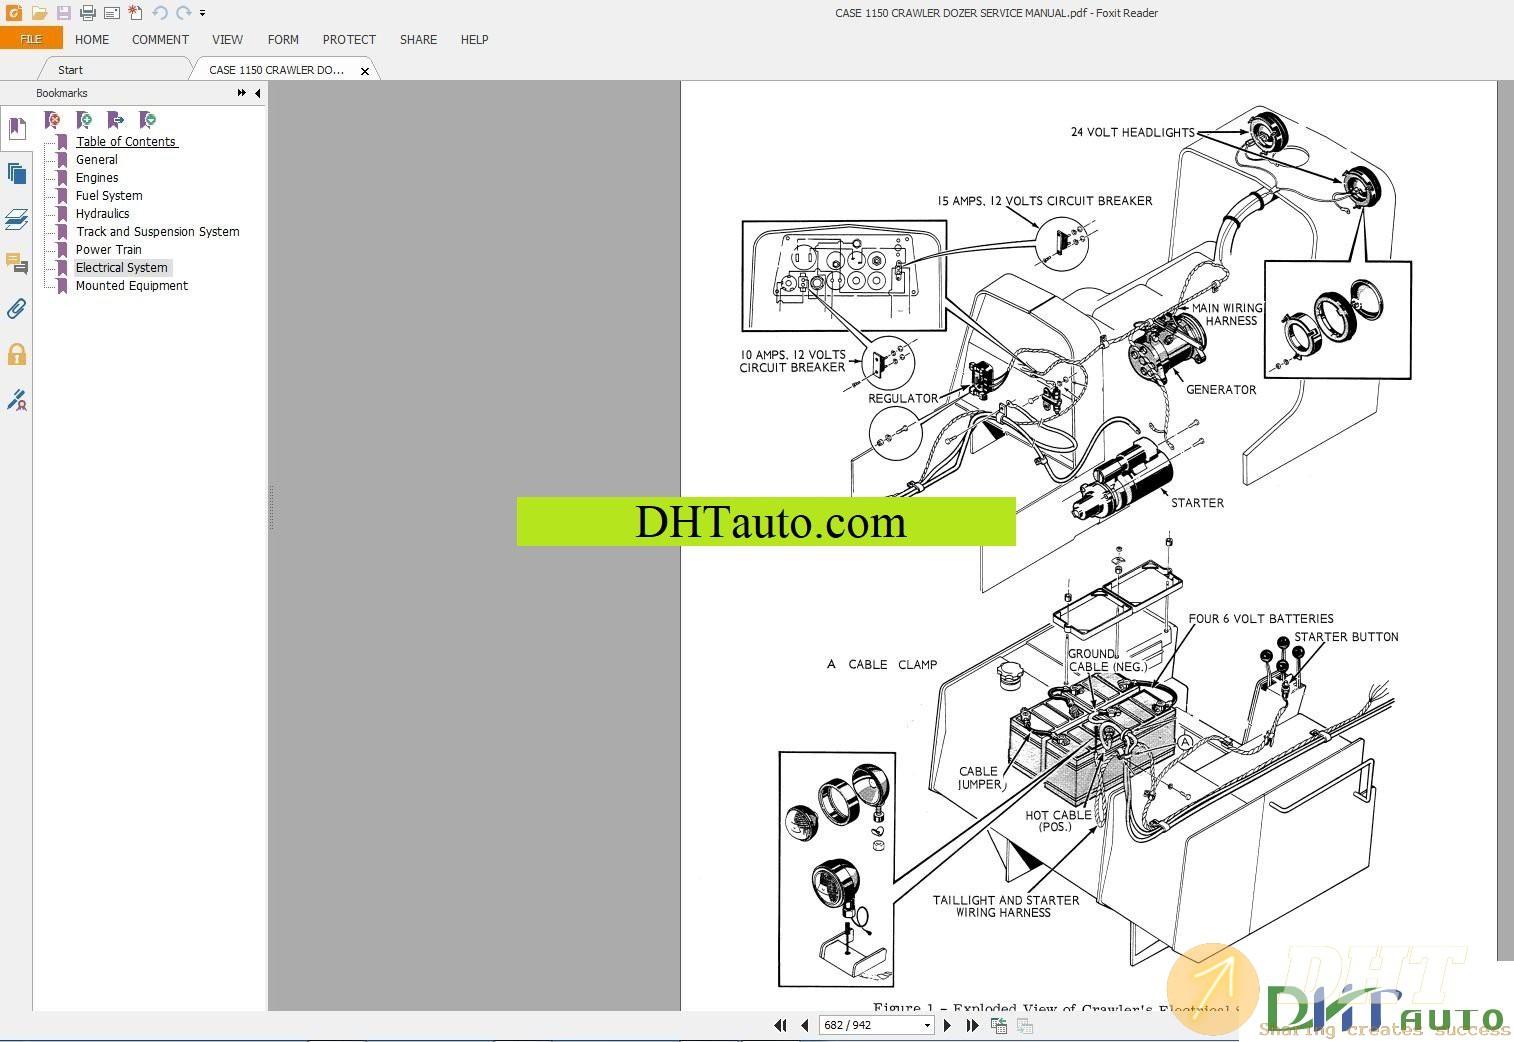 Case Crawler Dozer Operators & Service Manual 6.jpg